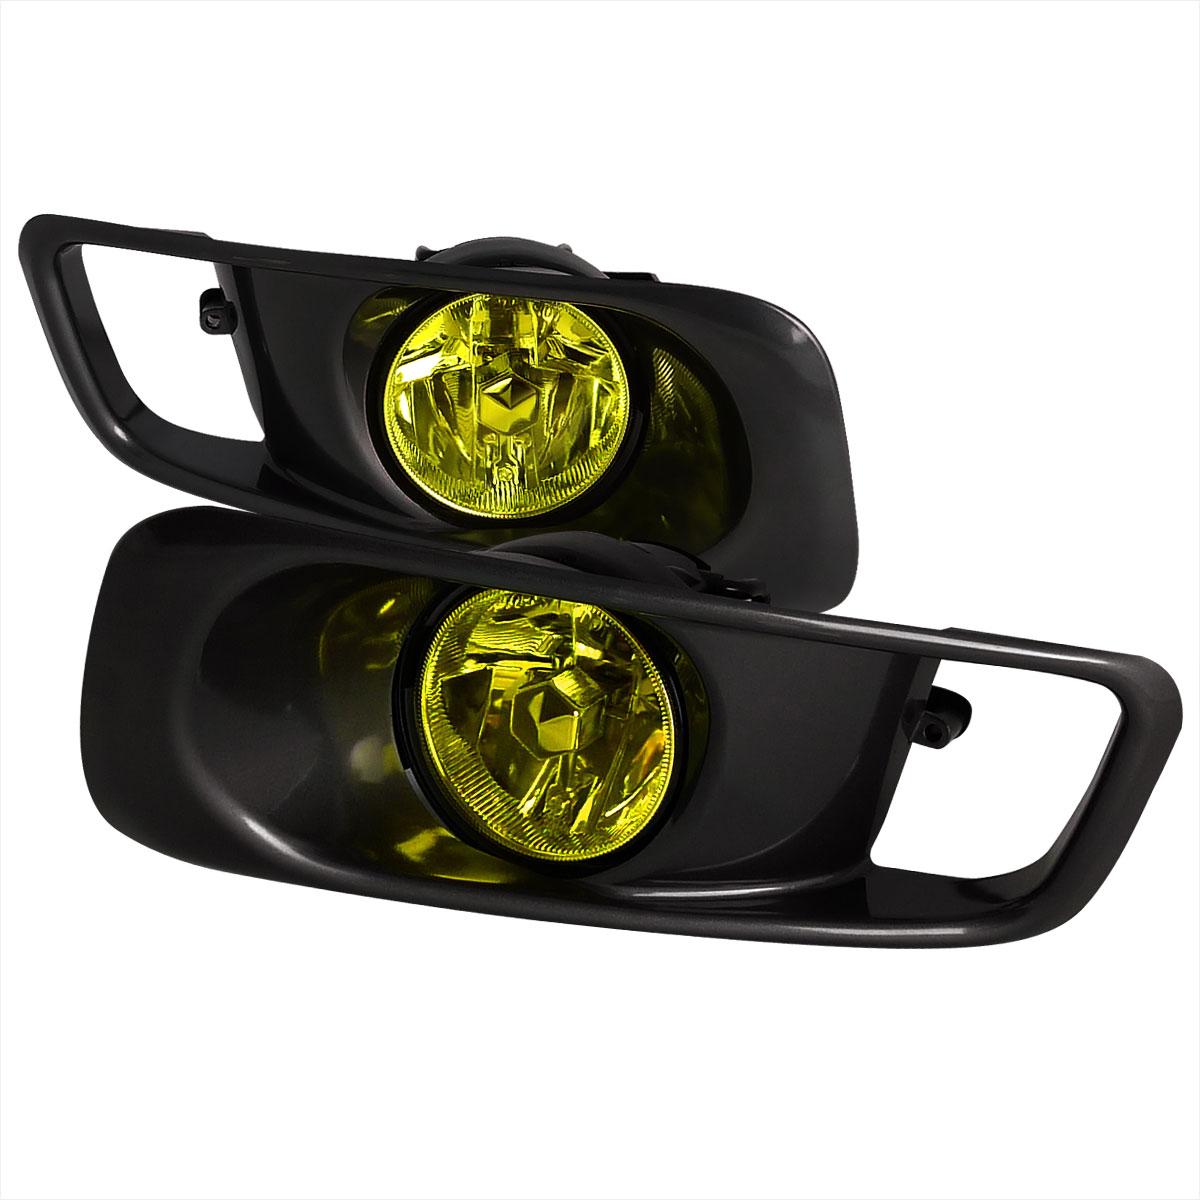 Spec-D Tuning LF-CV99AMOEM - Spec-D 99-00 Honda Civic Oem Fog Lights Yellow